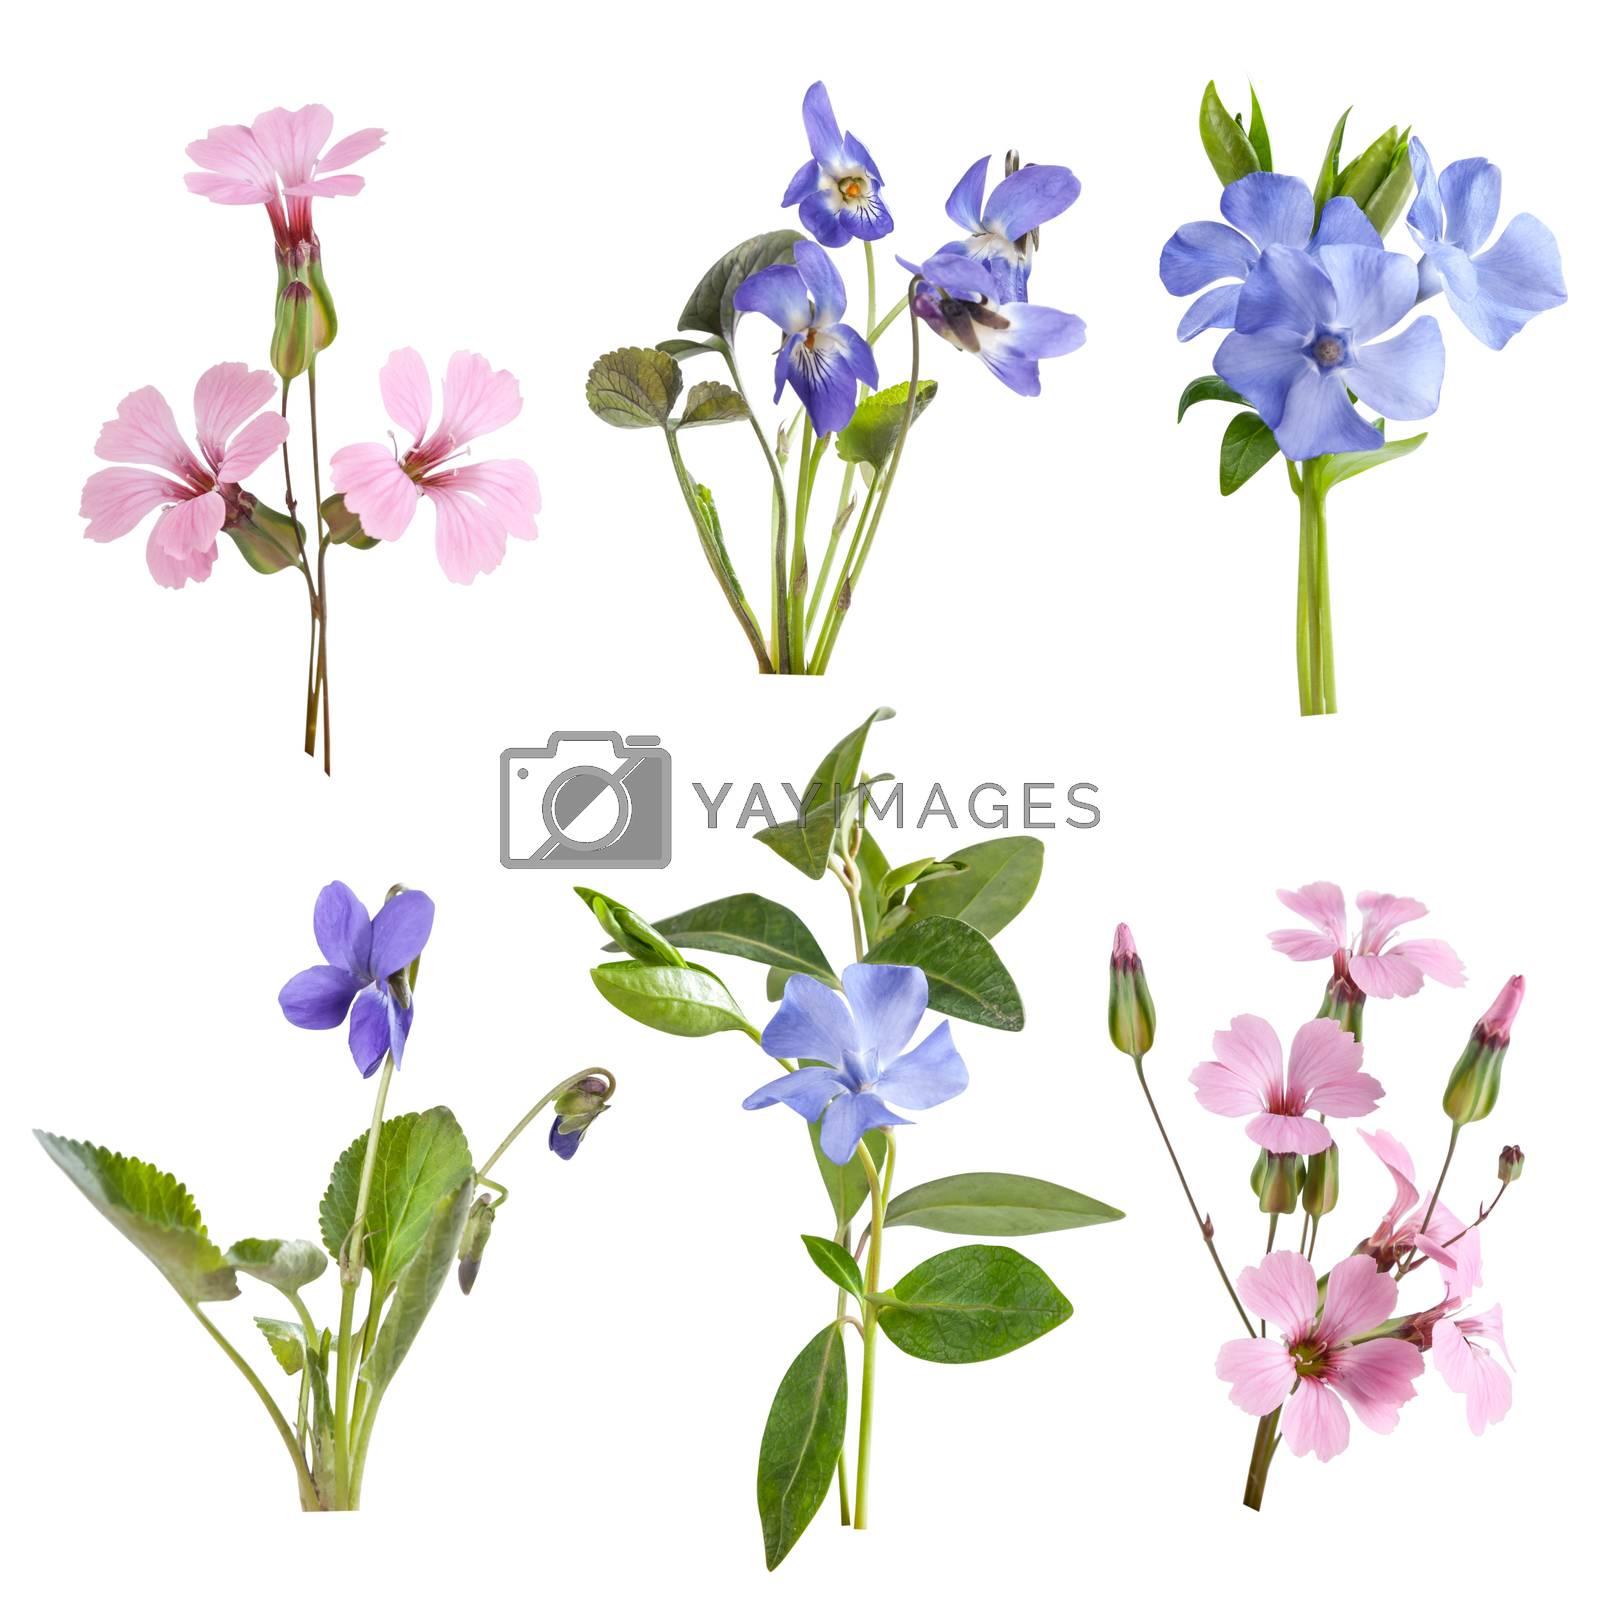 Wildflowers set isolated on white background